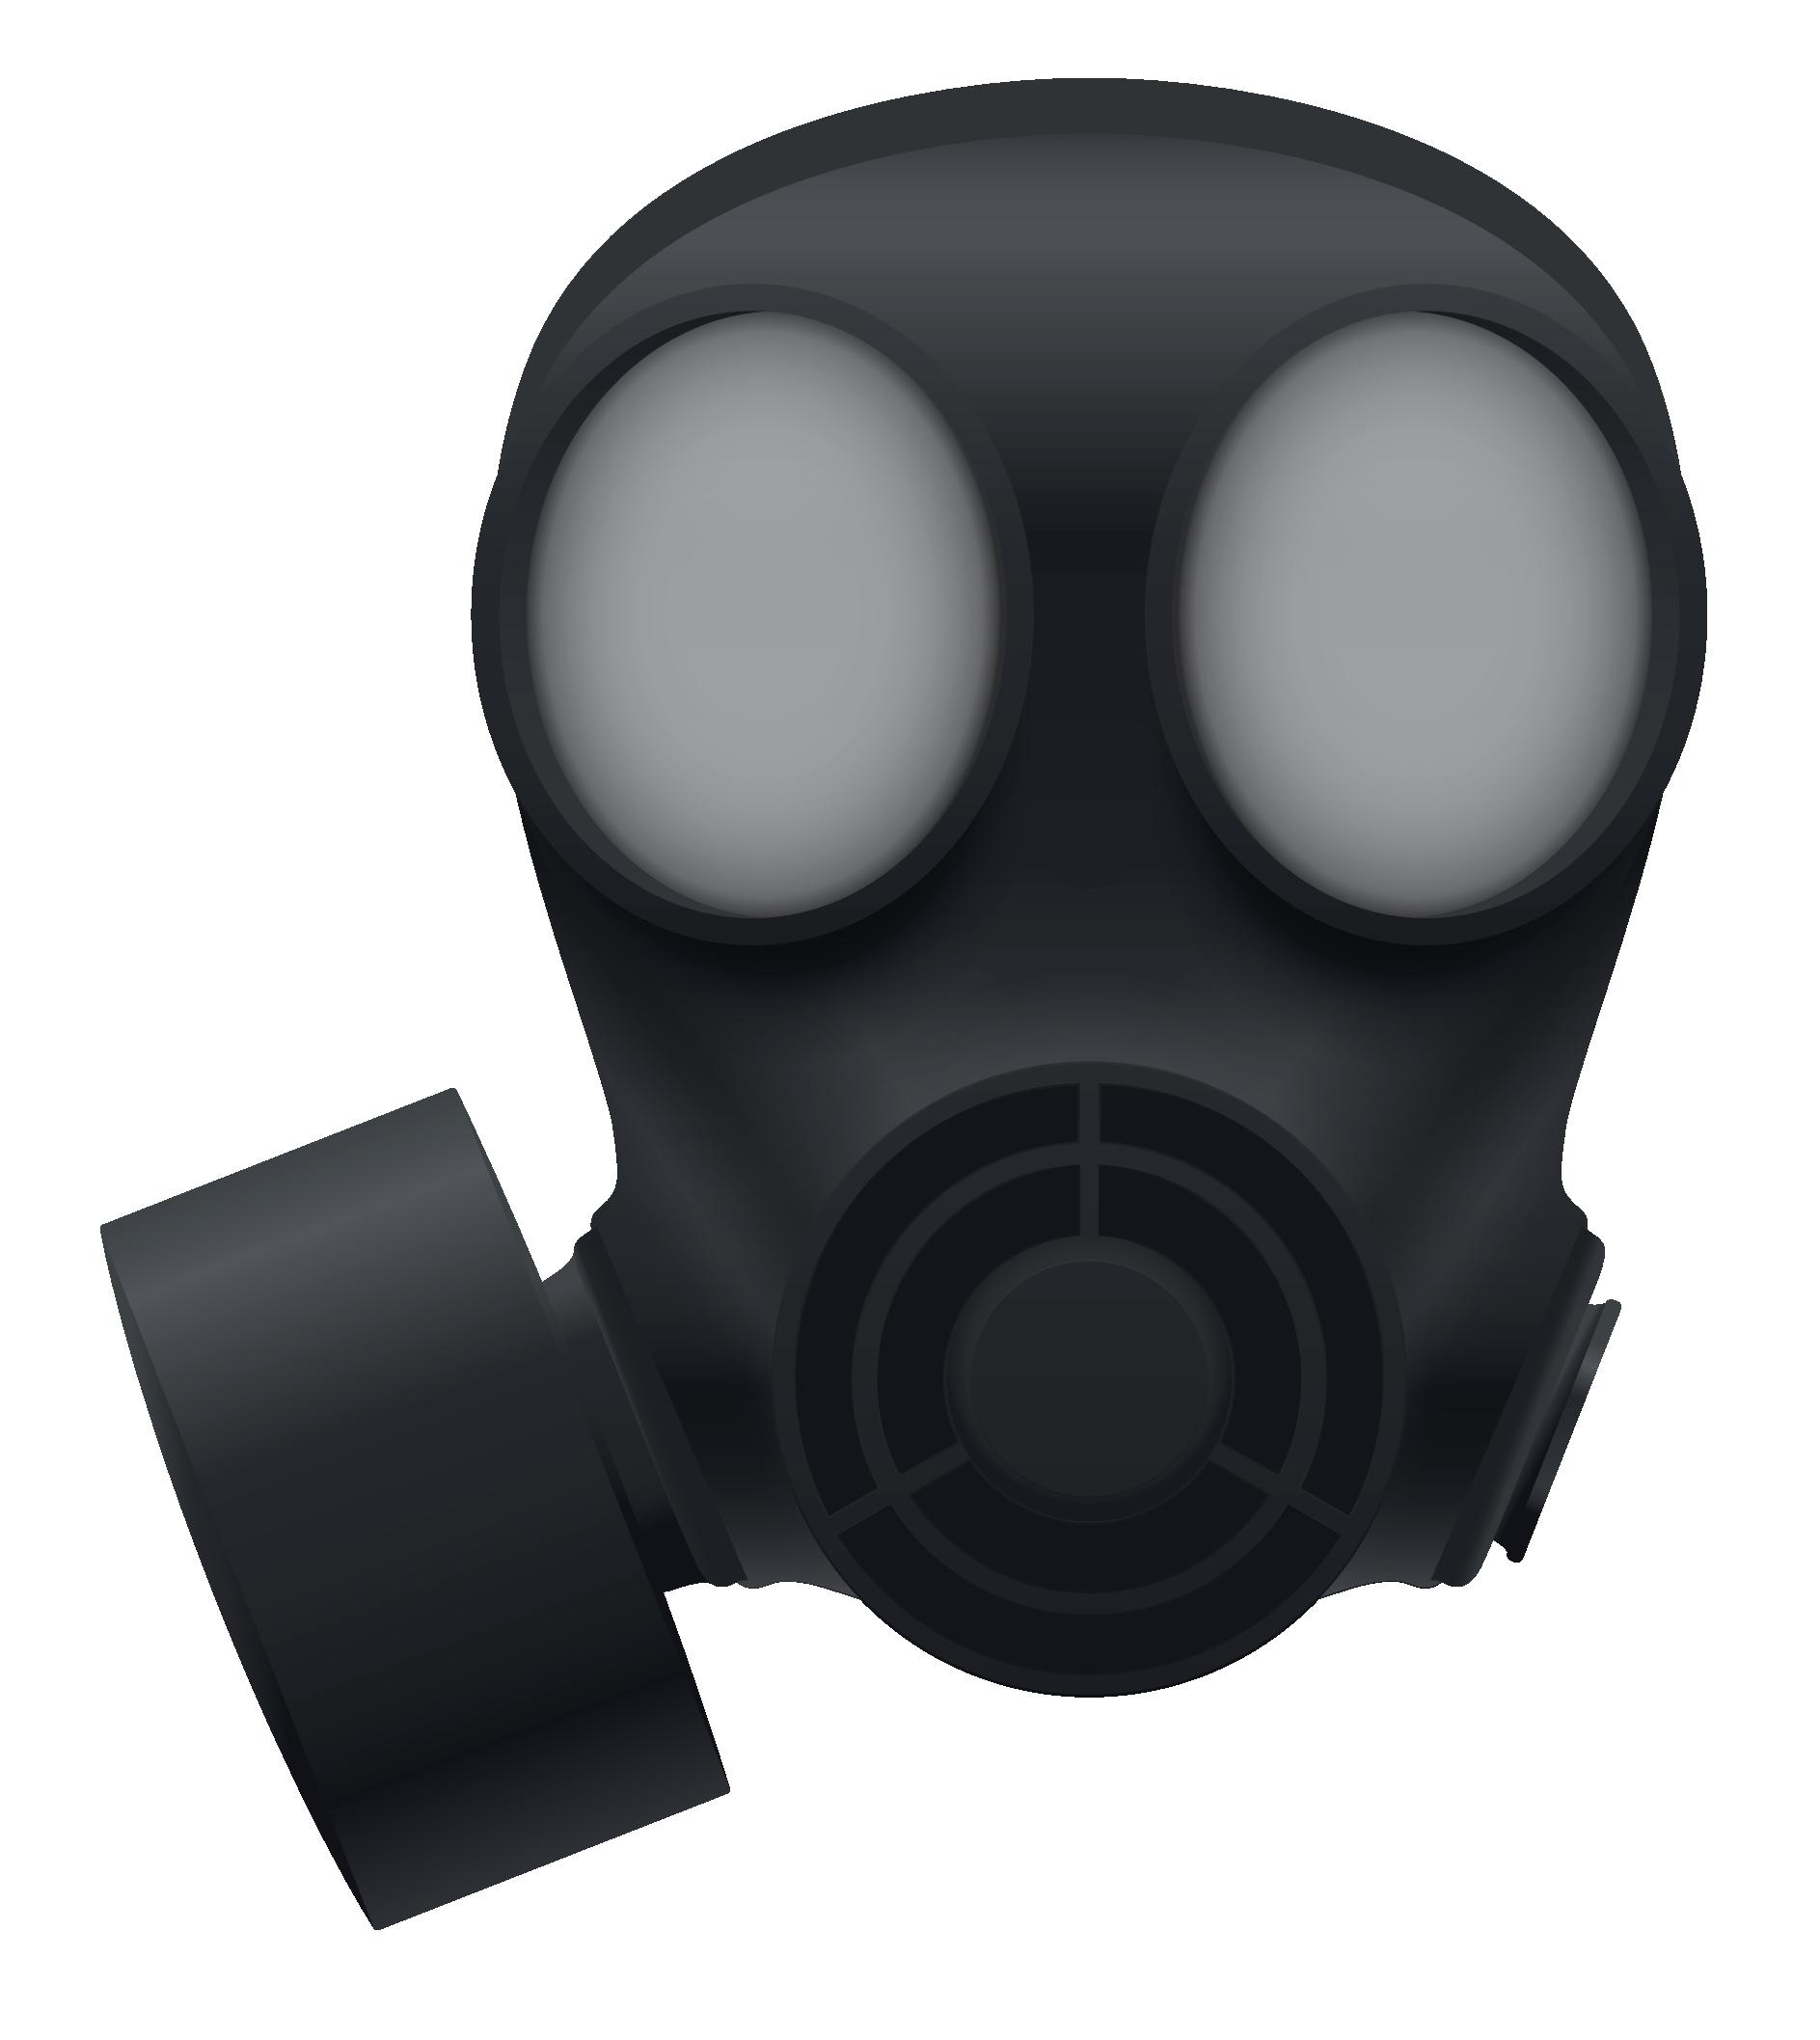 1887x2115 Mask Png Transparent Mask.png Images. Pluspng